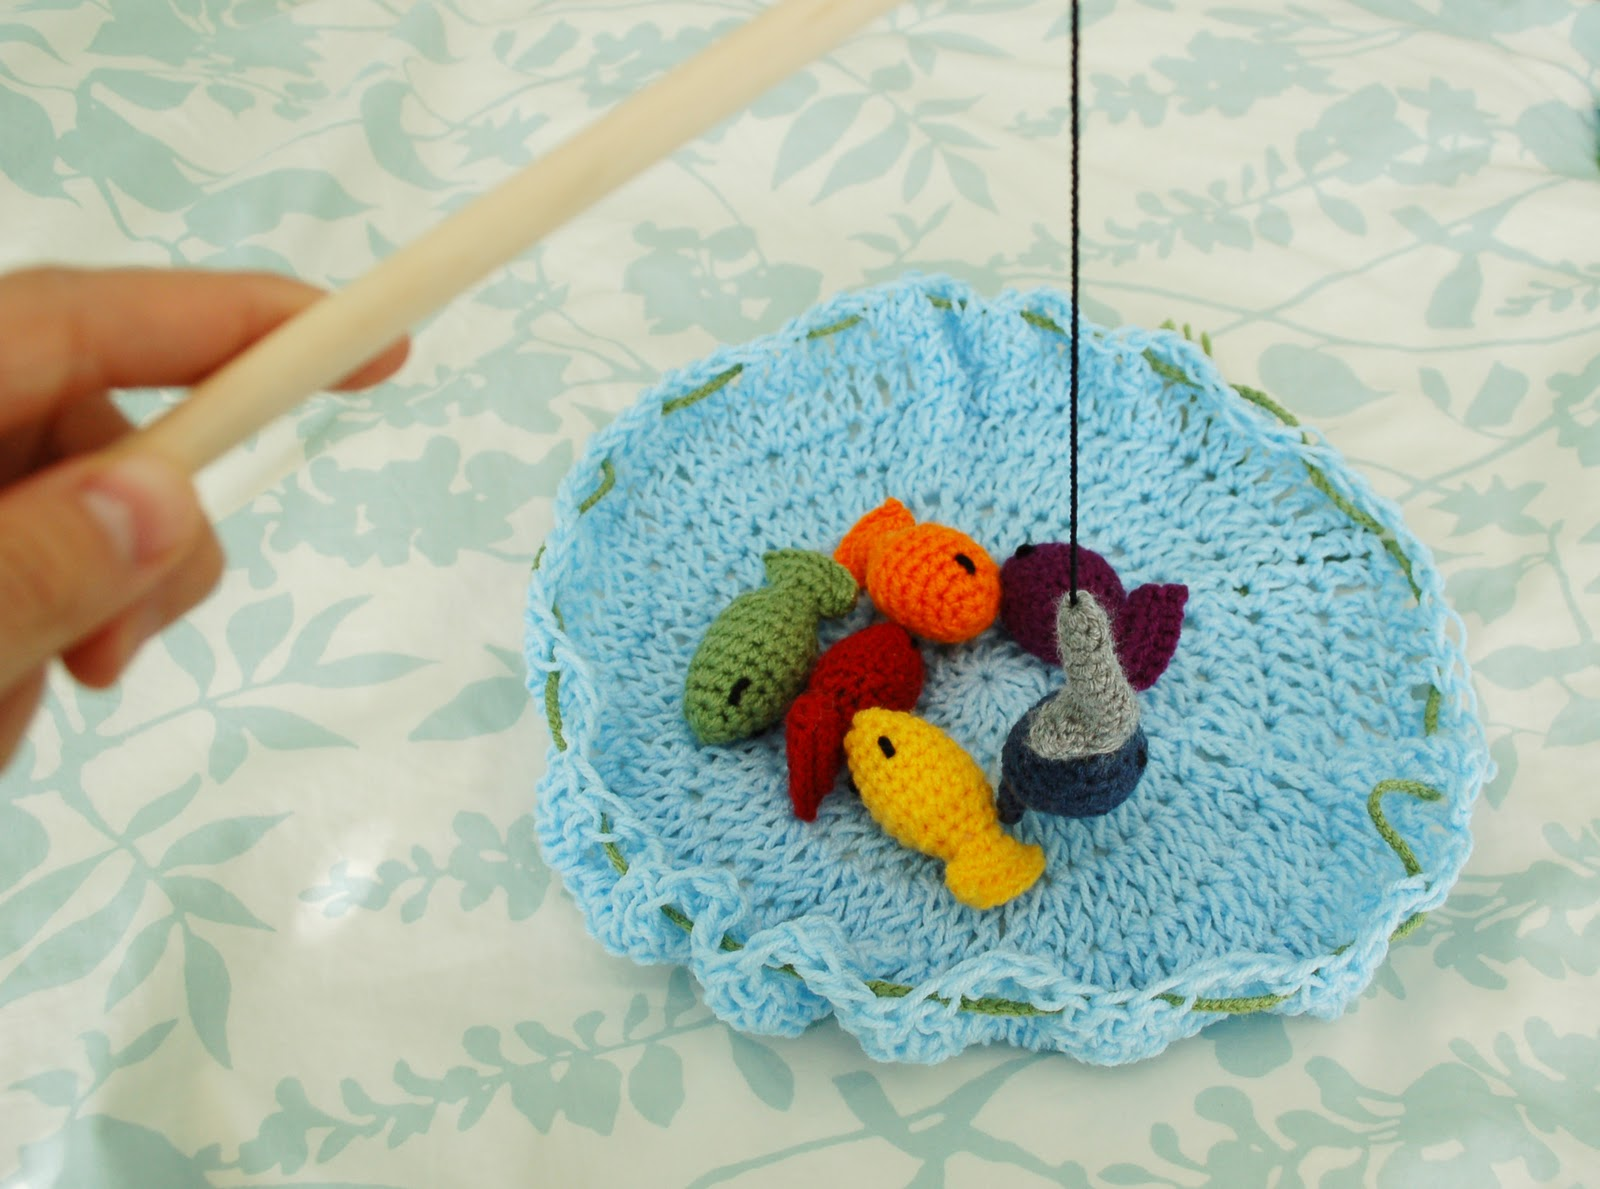 Crochet Fish Patterns Crochet Patterns